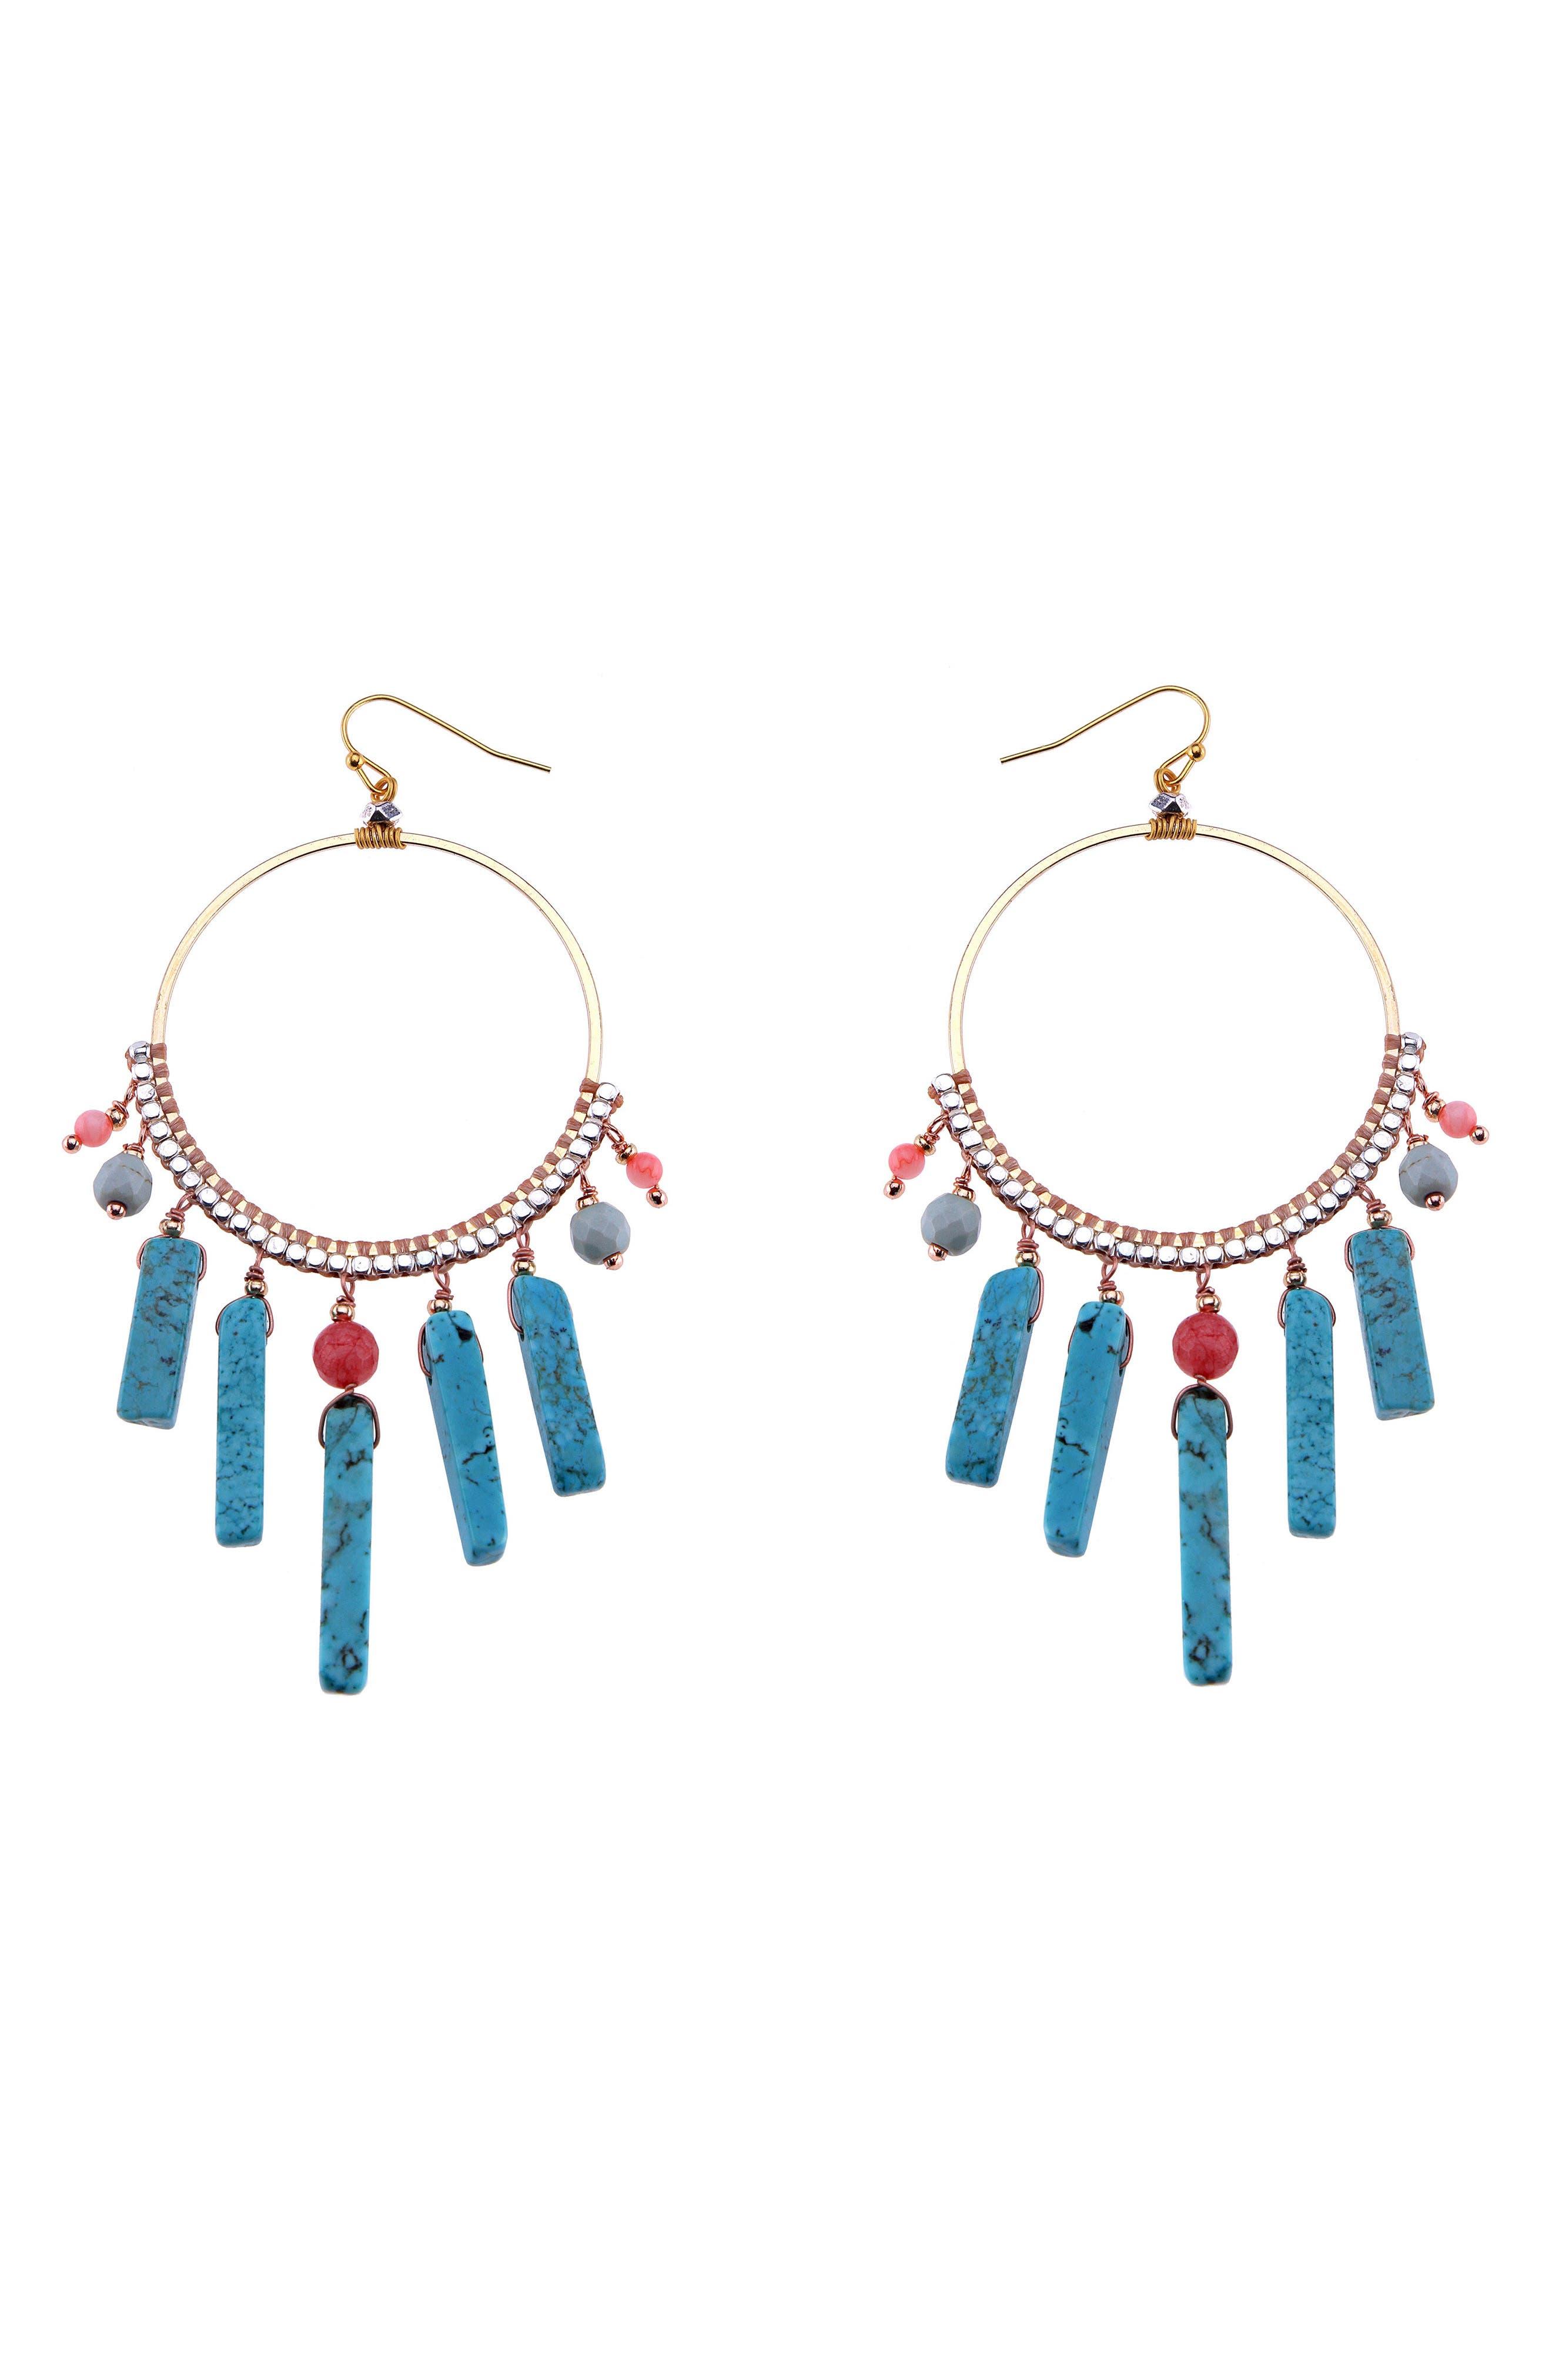 Howlite & Crystal Hoop Earrings,                             Main thumbnail 1, color,                             Turquoise